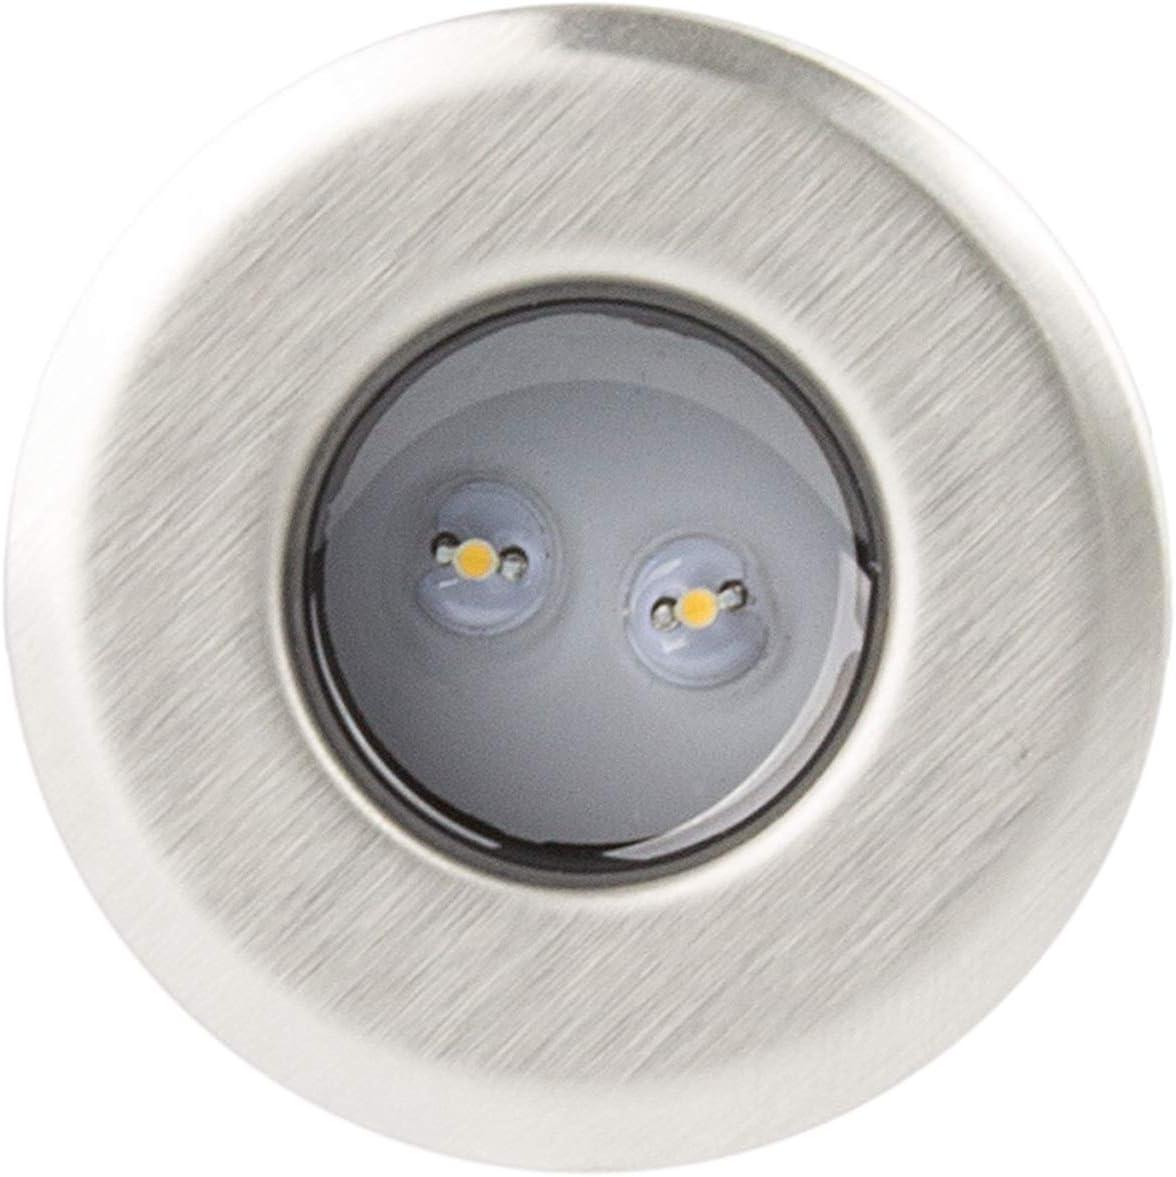 LEDKIA LIGHTING Mini Balizas LED Empotrables 0.2W Blanco Frío 5500K - 6000K: Amazon.es: Iluminación